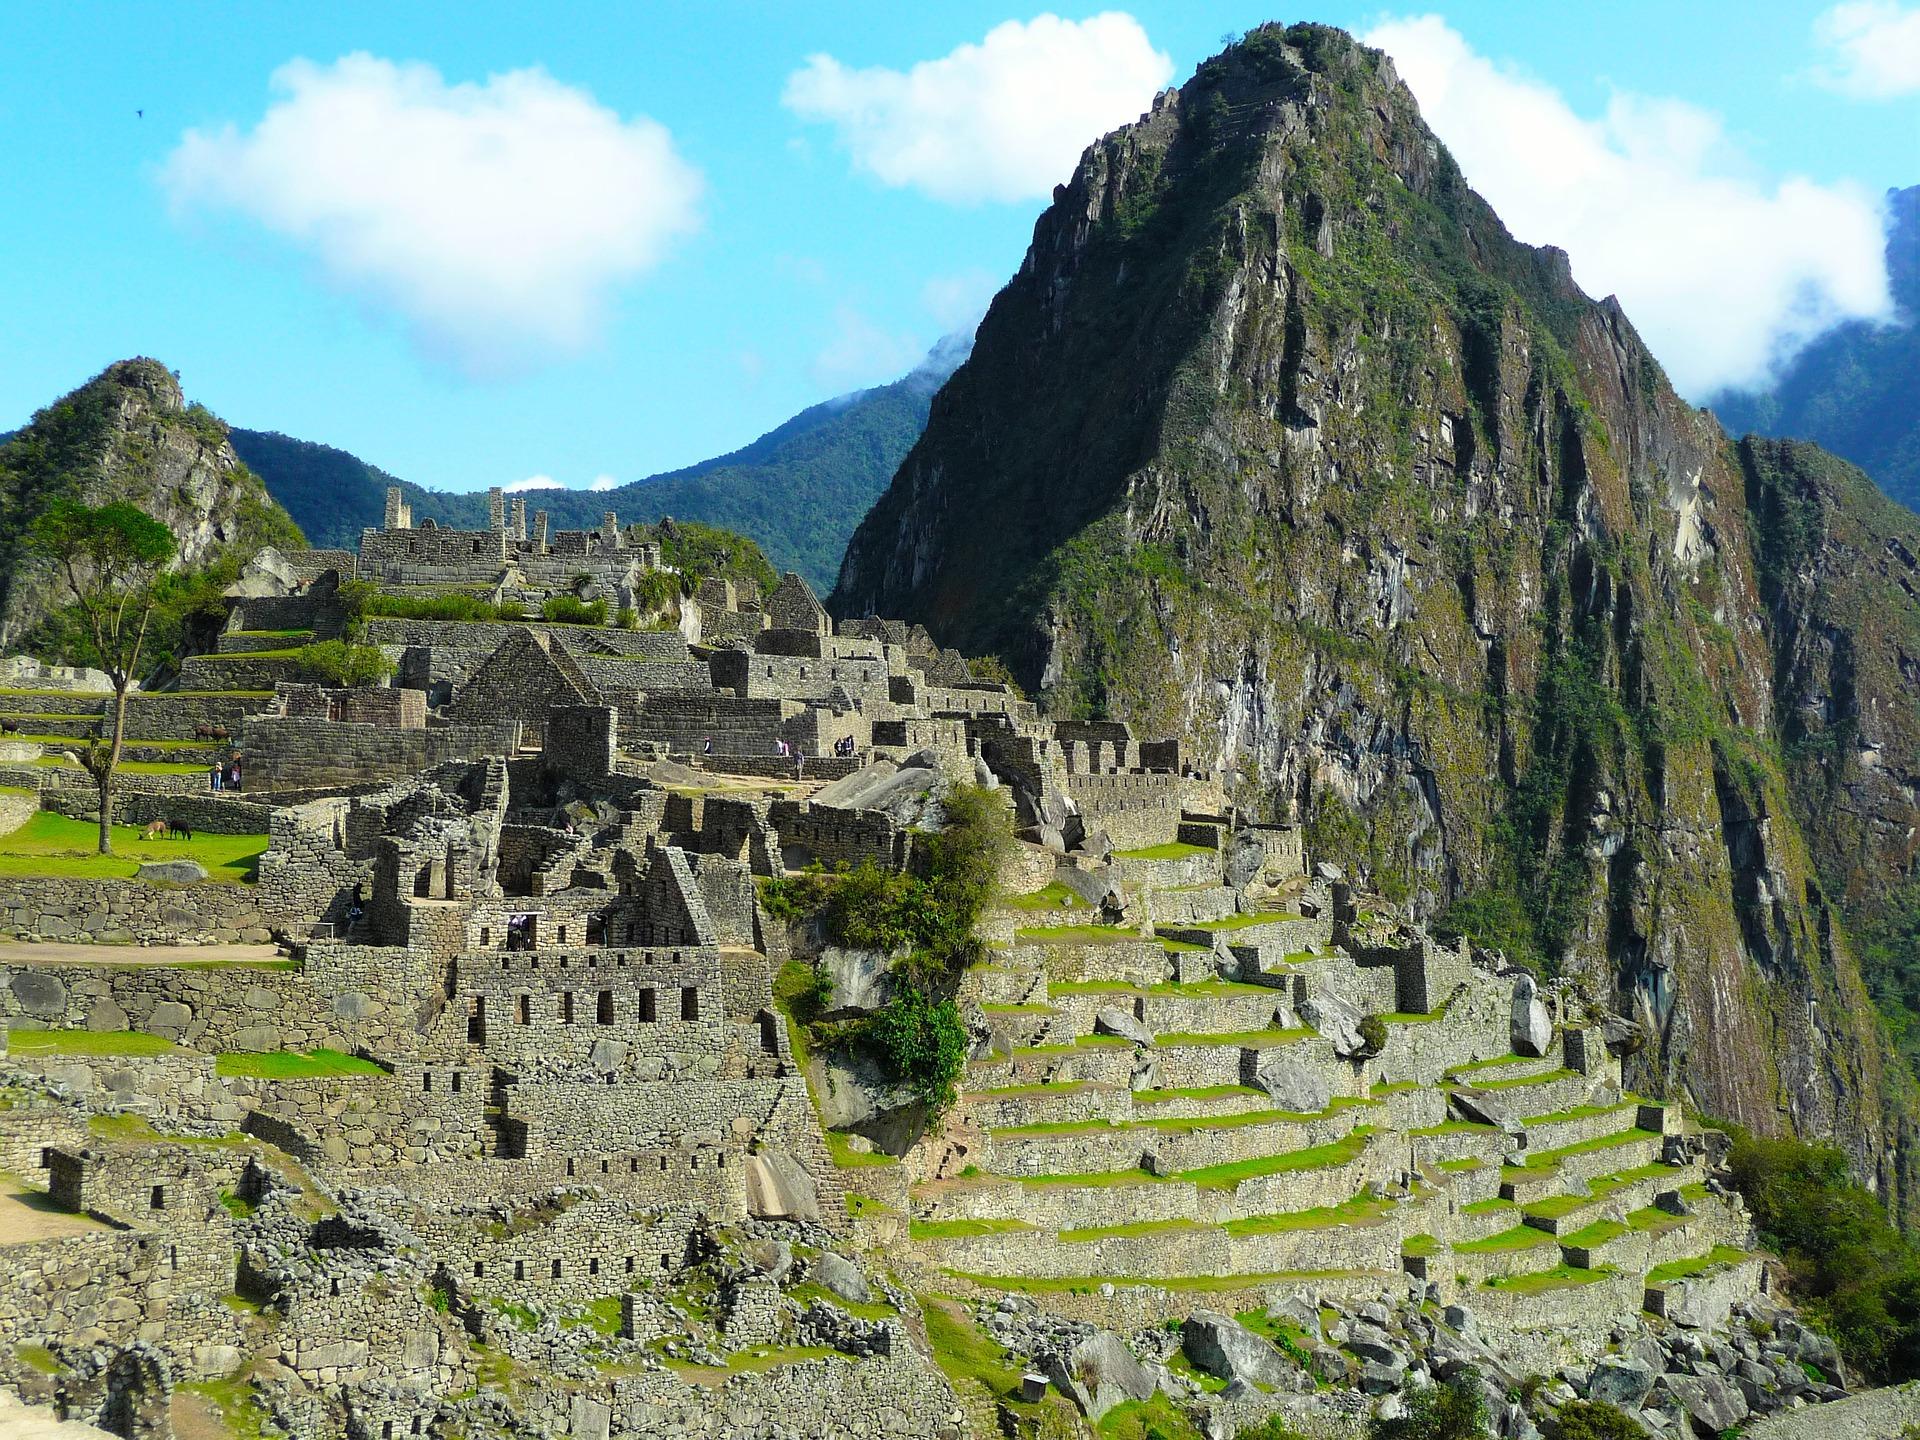 Machu Picchu descubrimiento